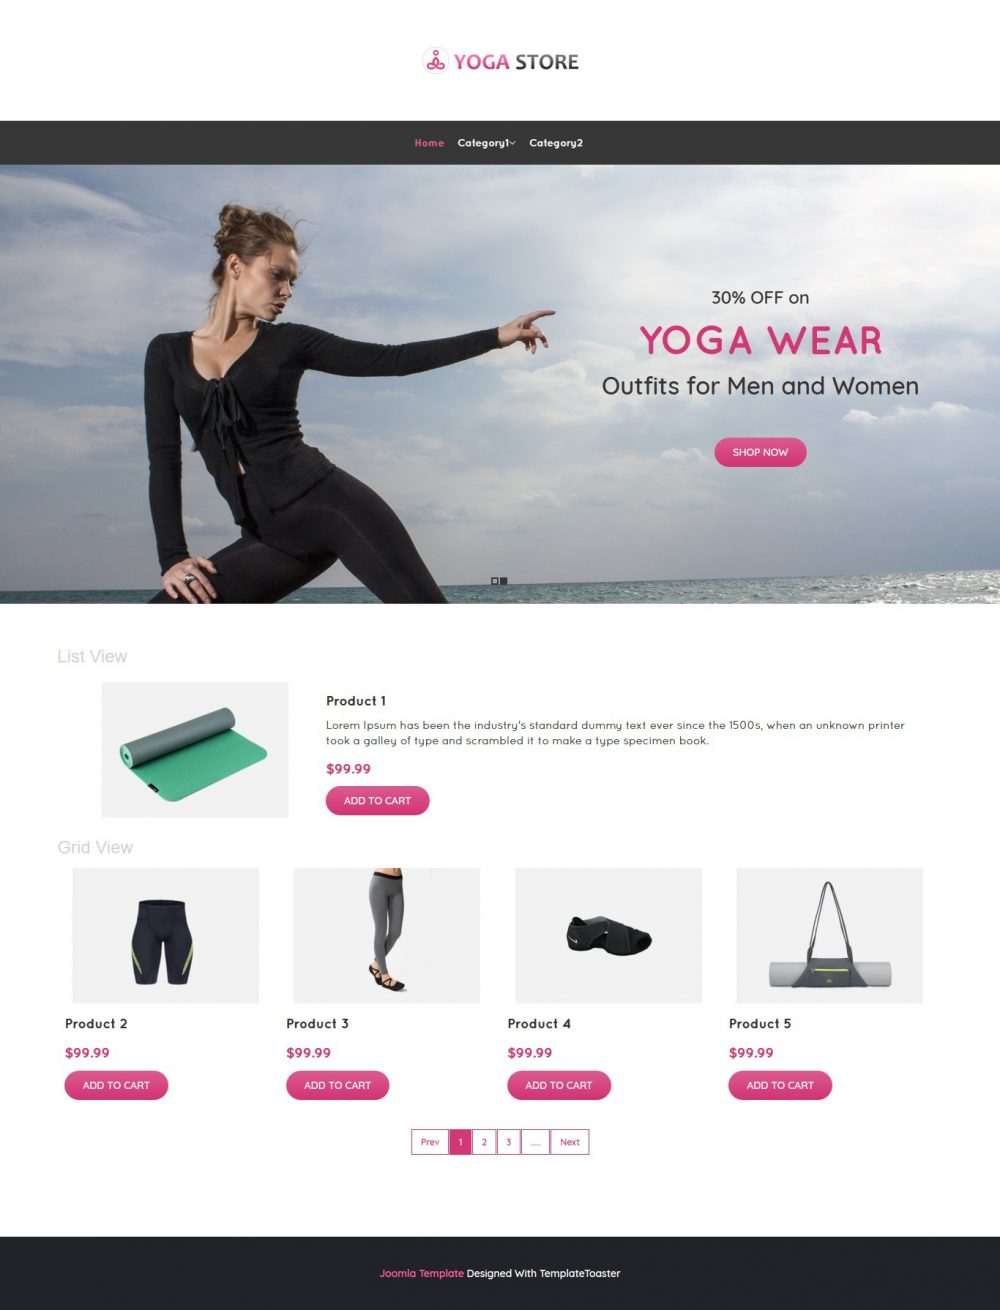 Yoga Store Product Shop Virtuemart Template